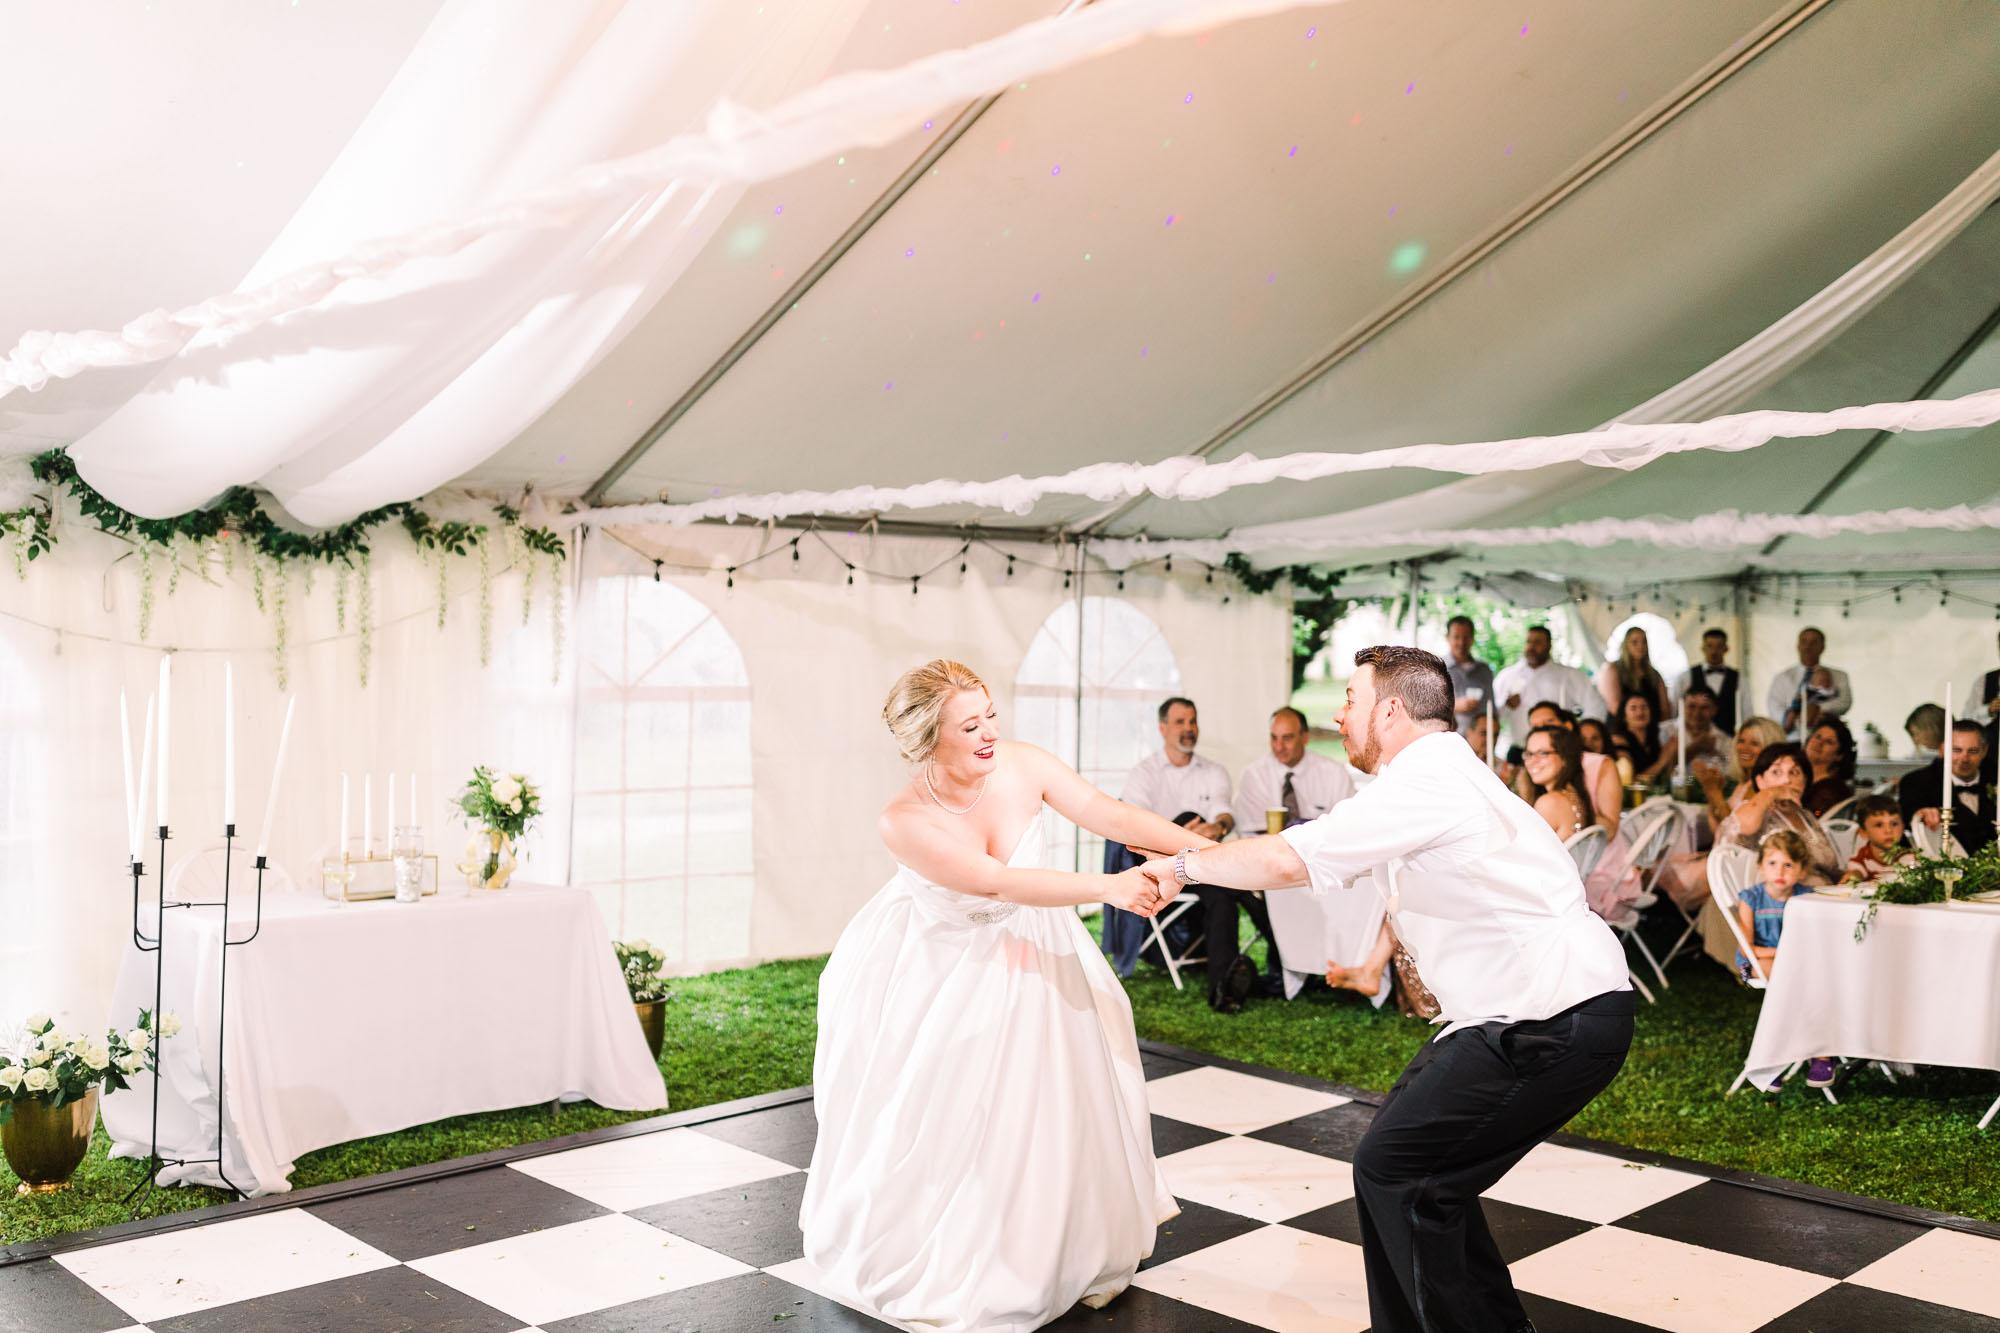 isle-of-que-wedding-7138.jpg